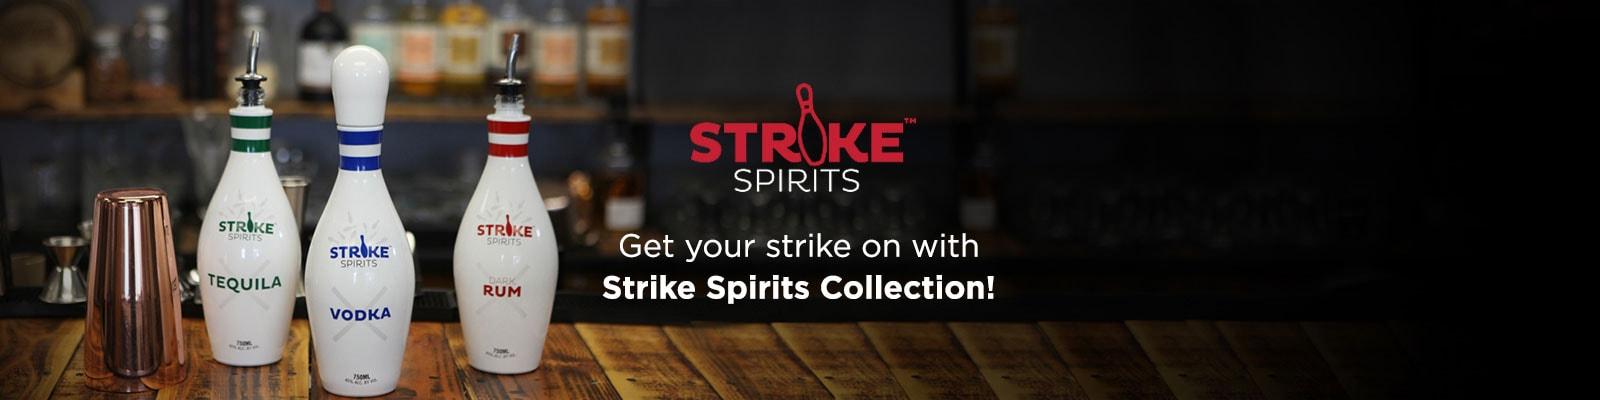 Strike Spirits